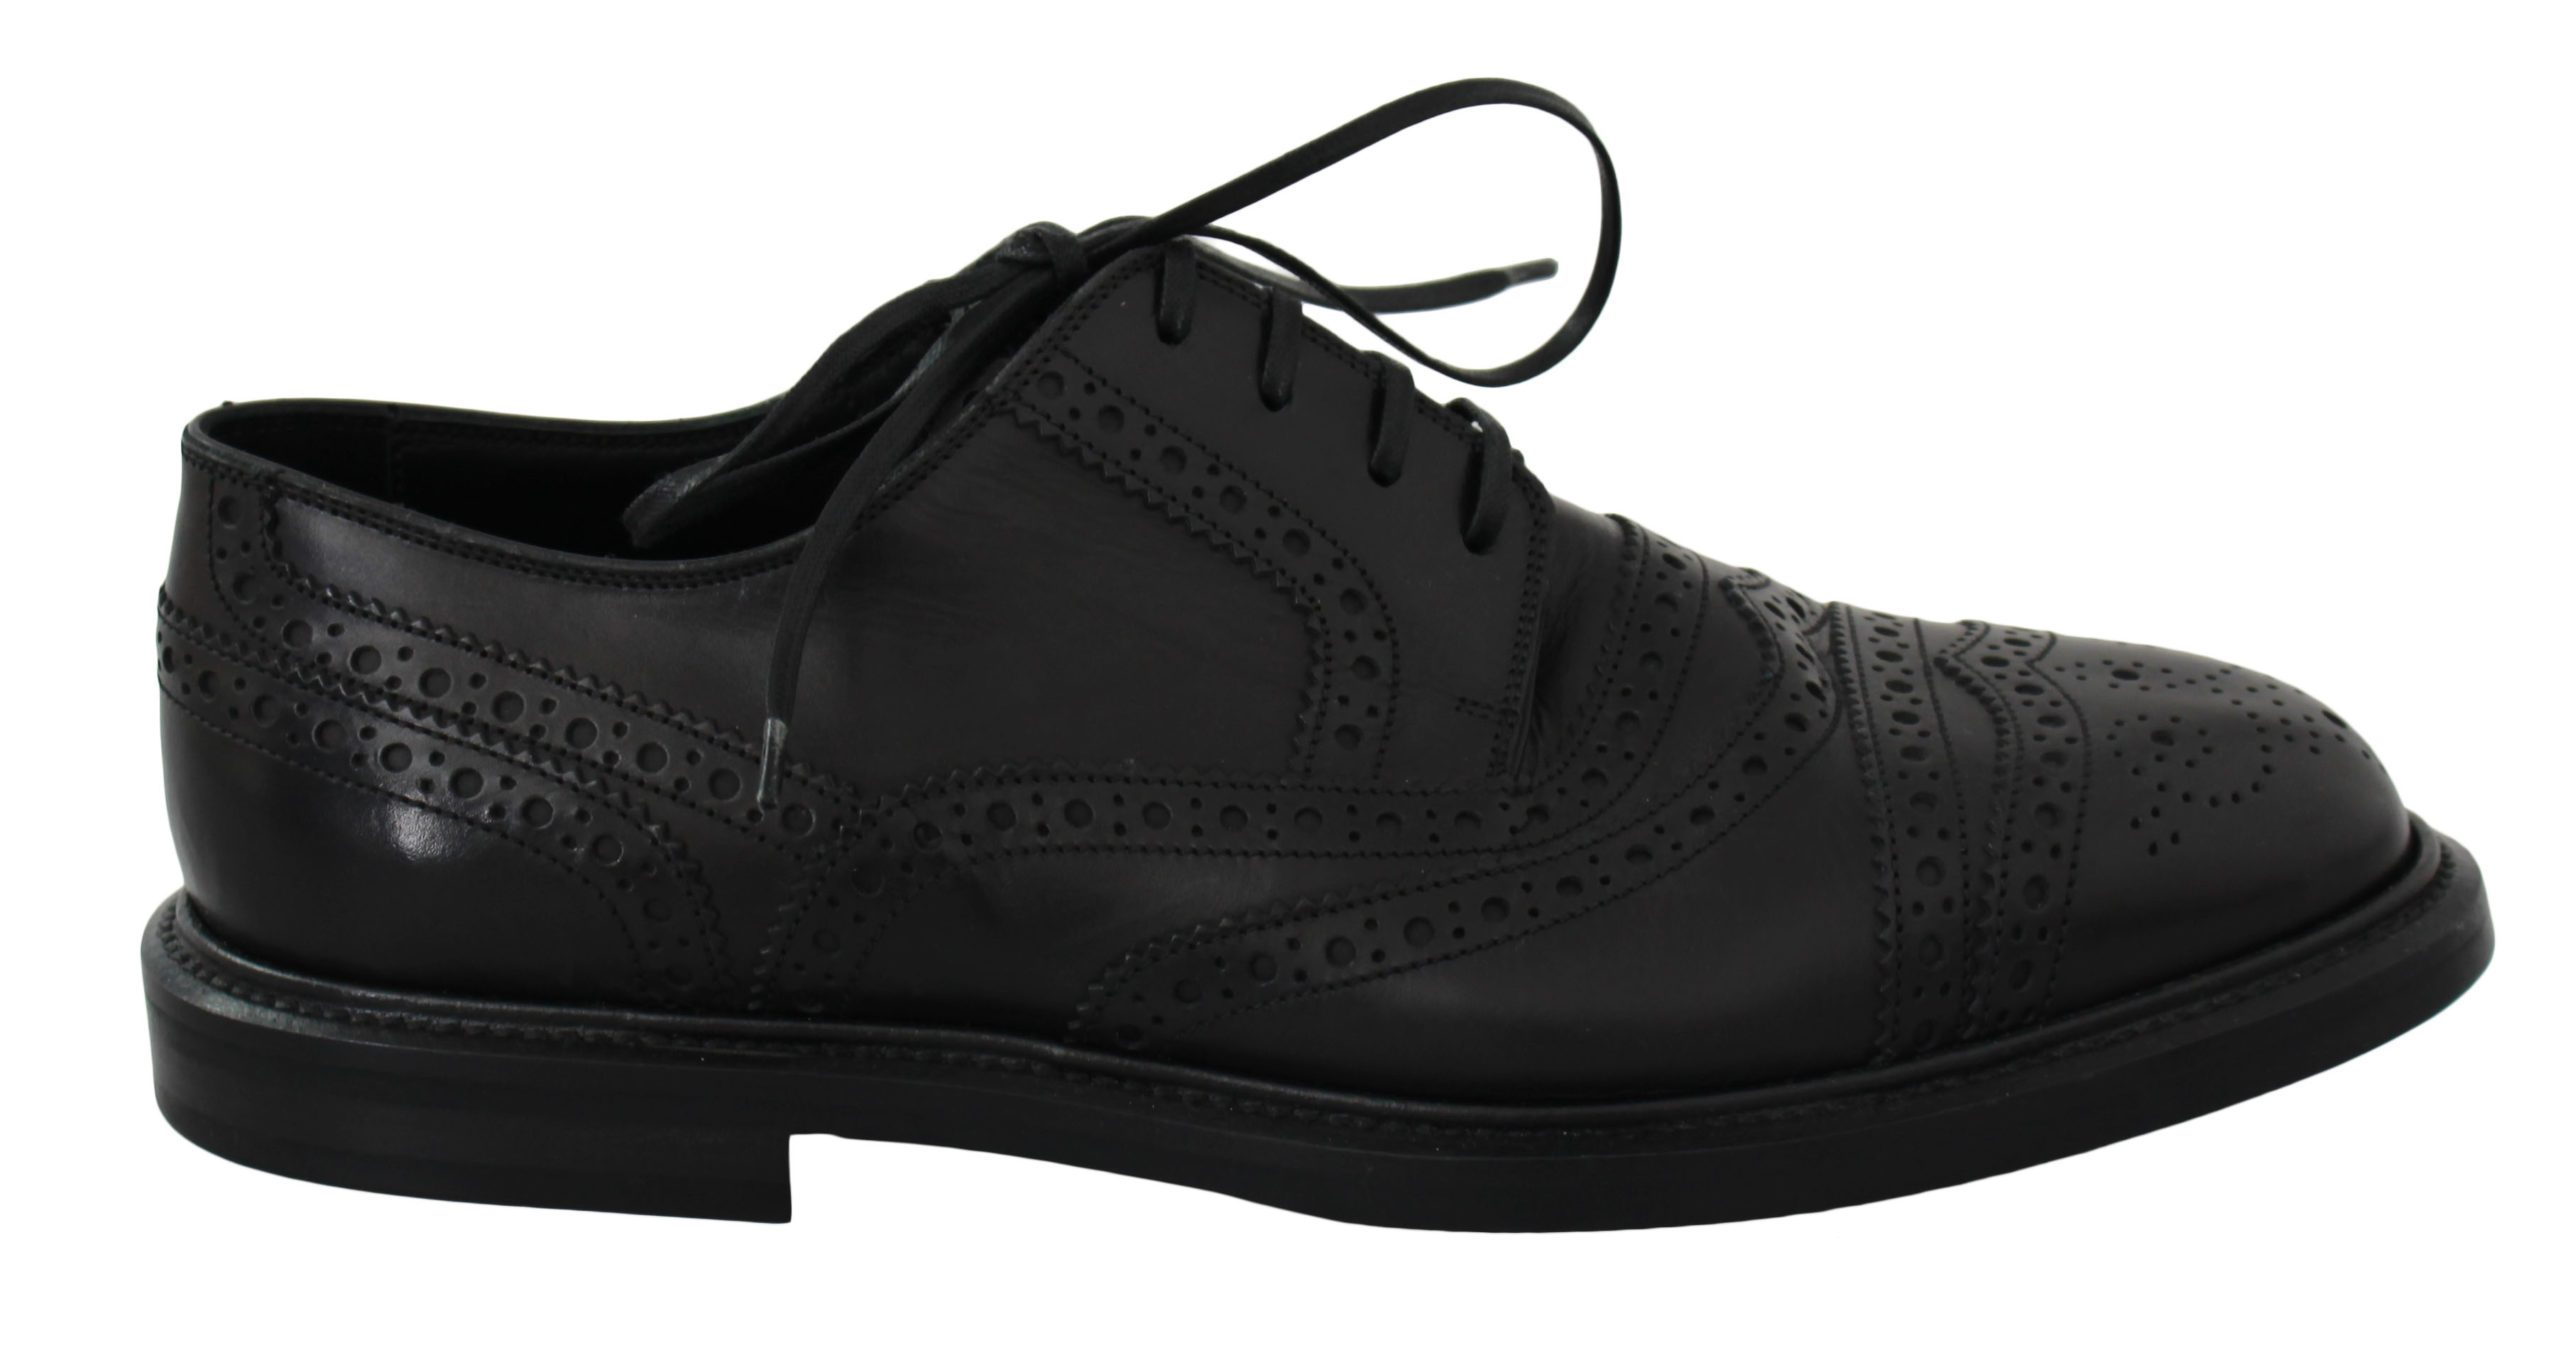 Dolce & Gabbana Men's Leather Dress Brogues Shoes Black MV2505 - EU40/US7